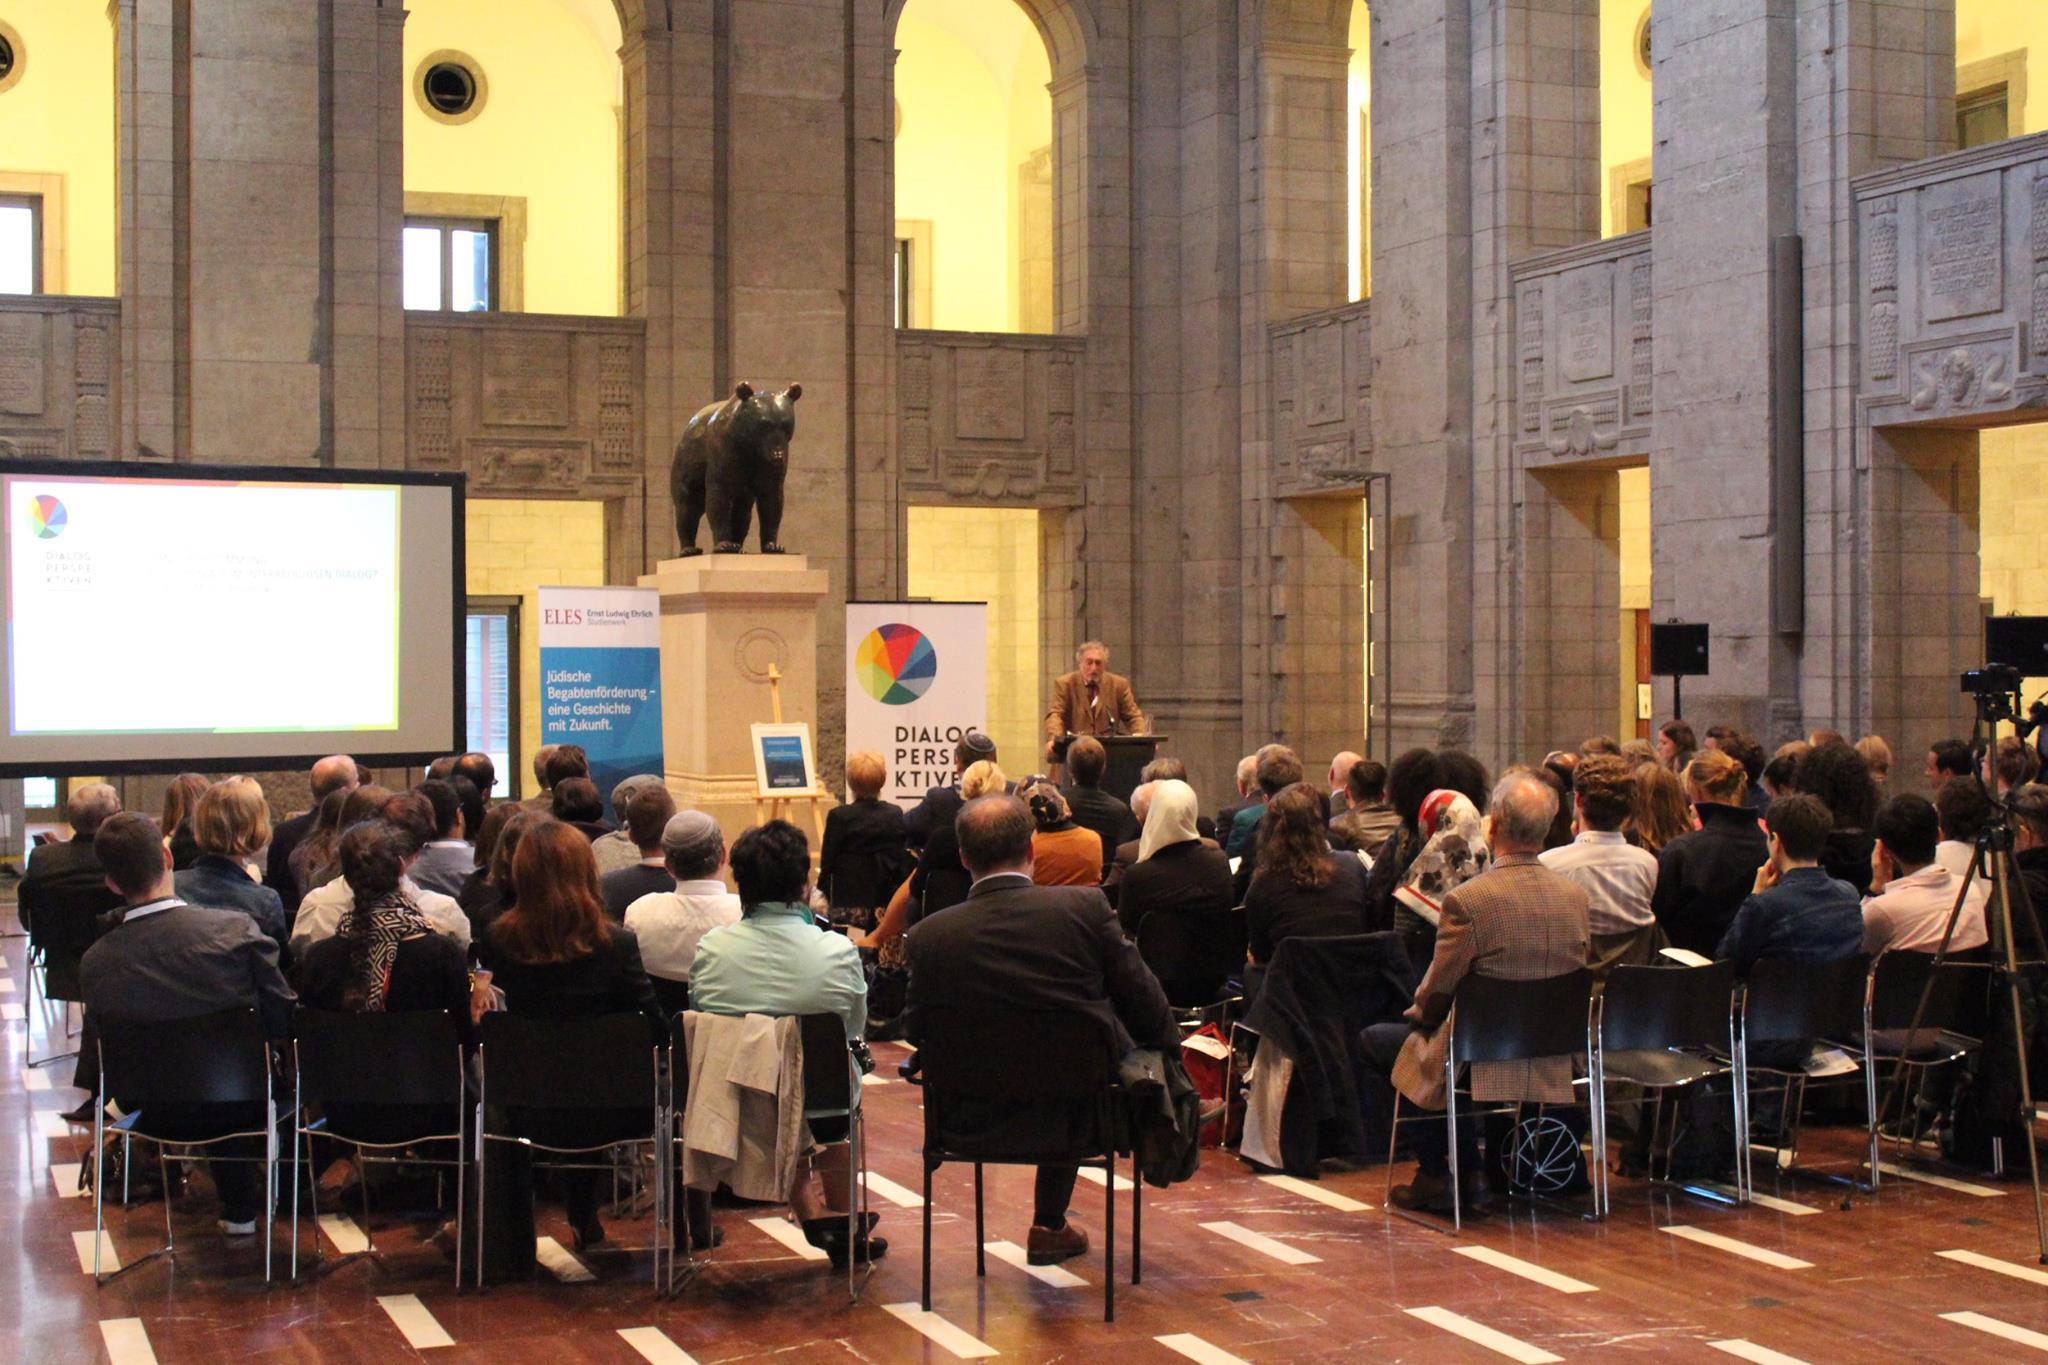 Dialogperspektiven-Auftakt: Micha Brumlik. Bild: Jonas Fegert